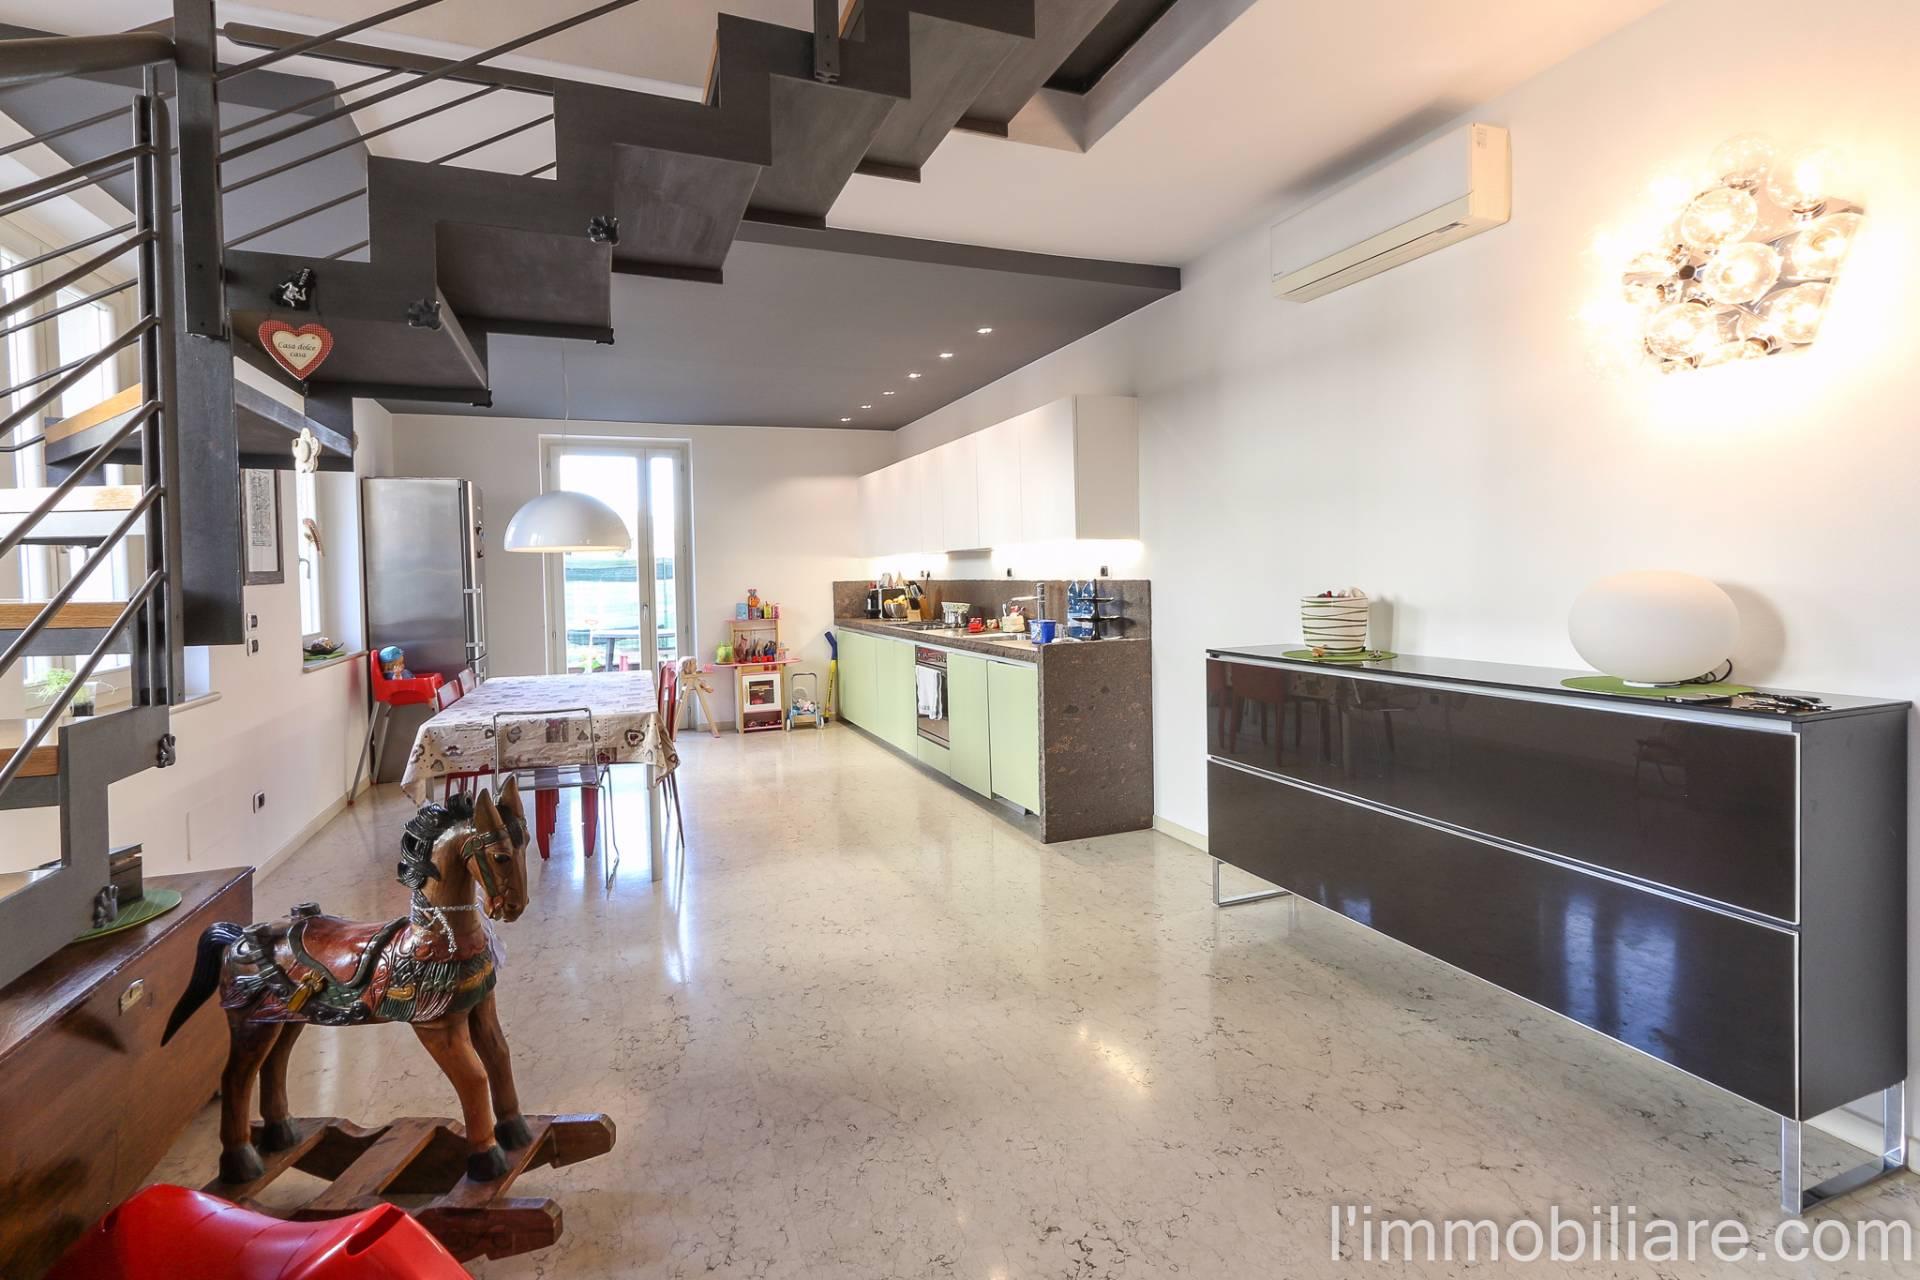 Casa indipendente in vendita a verona via cesare betteloni for Comprare garage indipendente